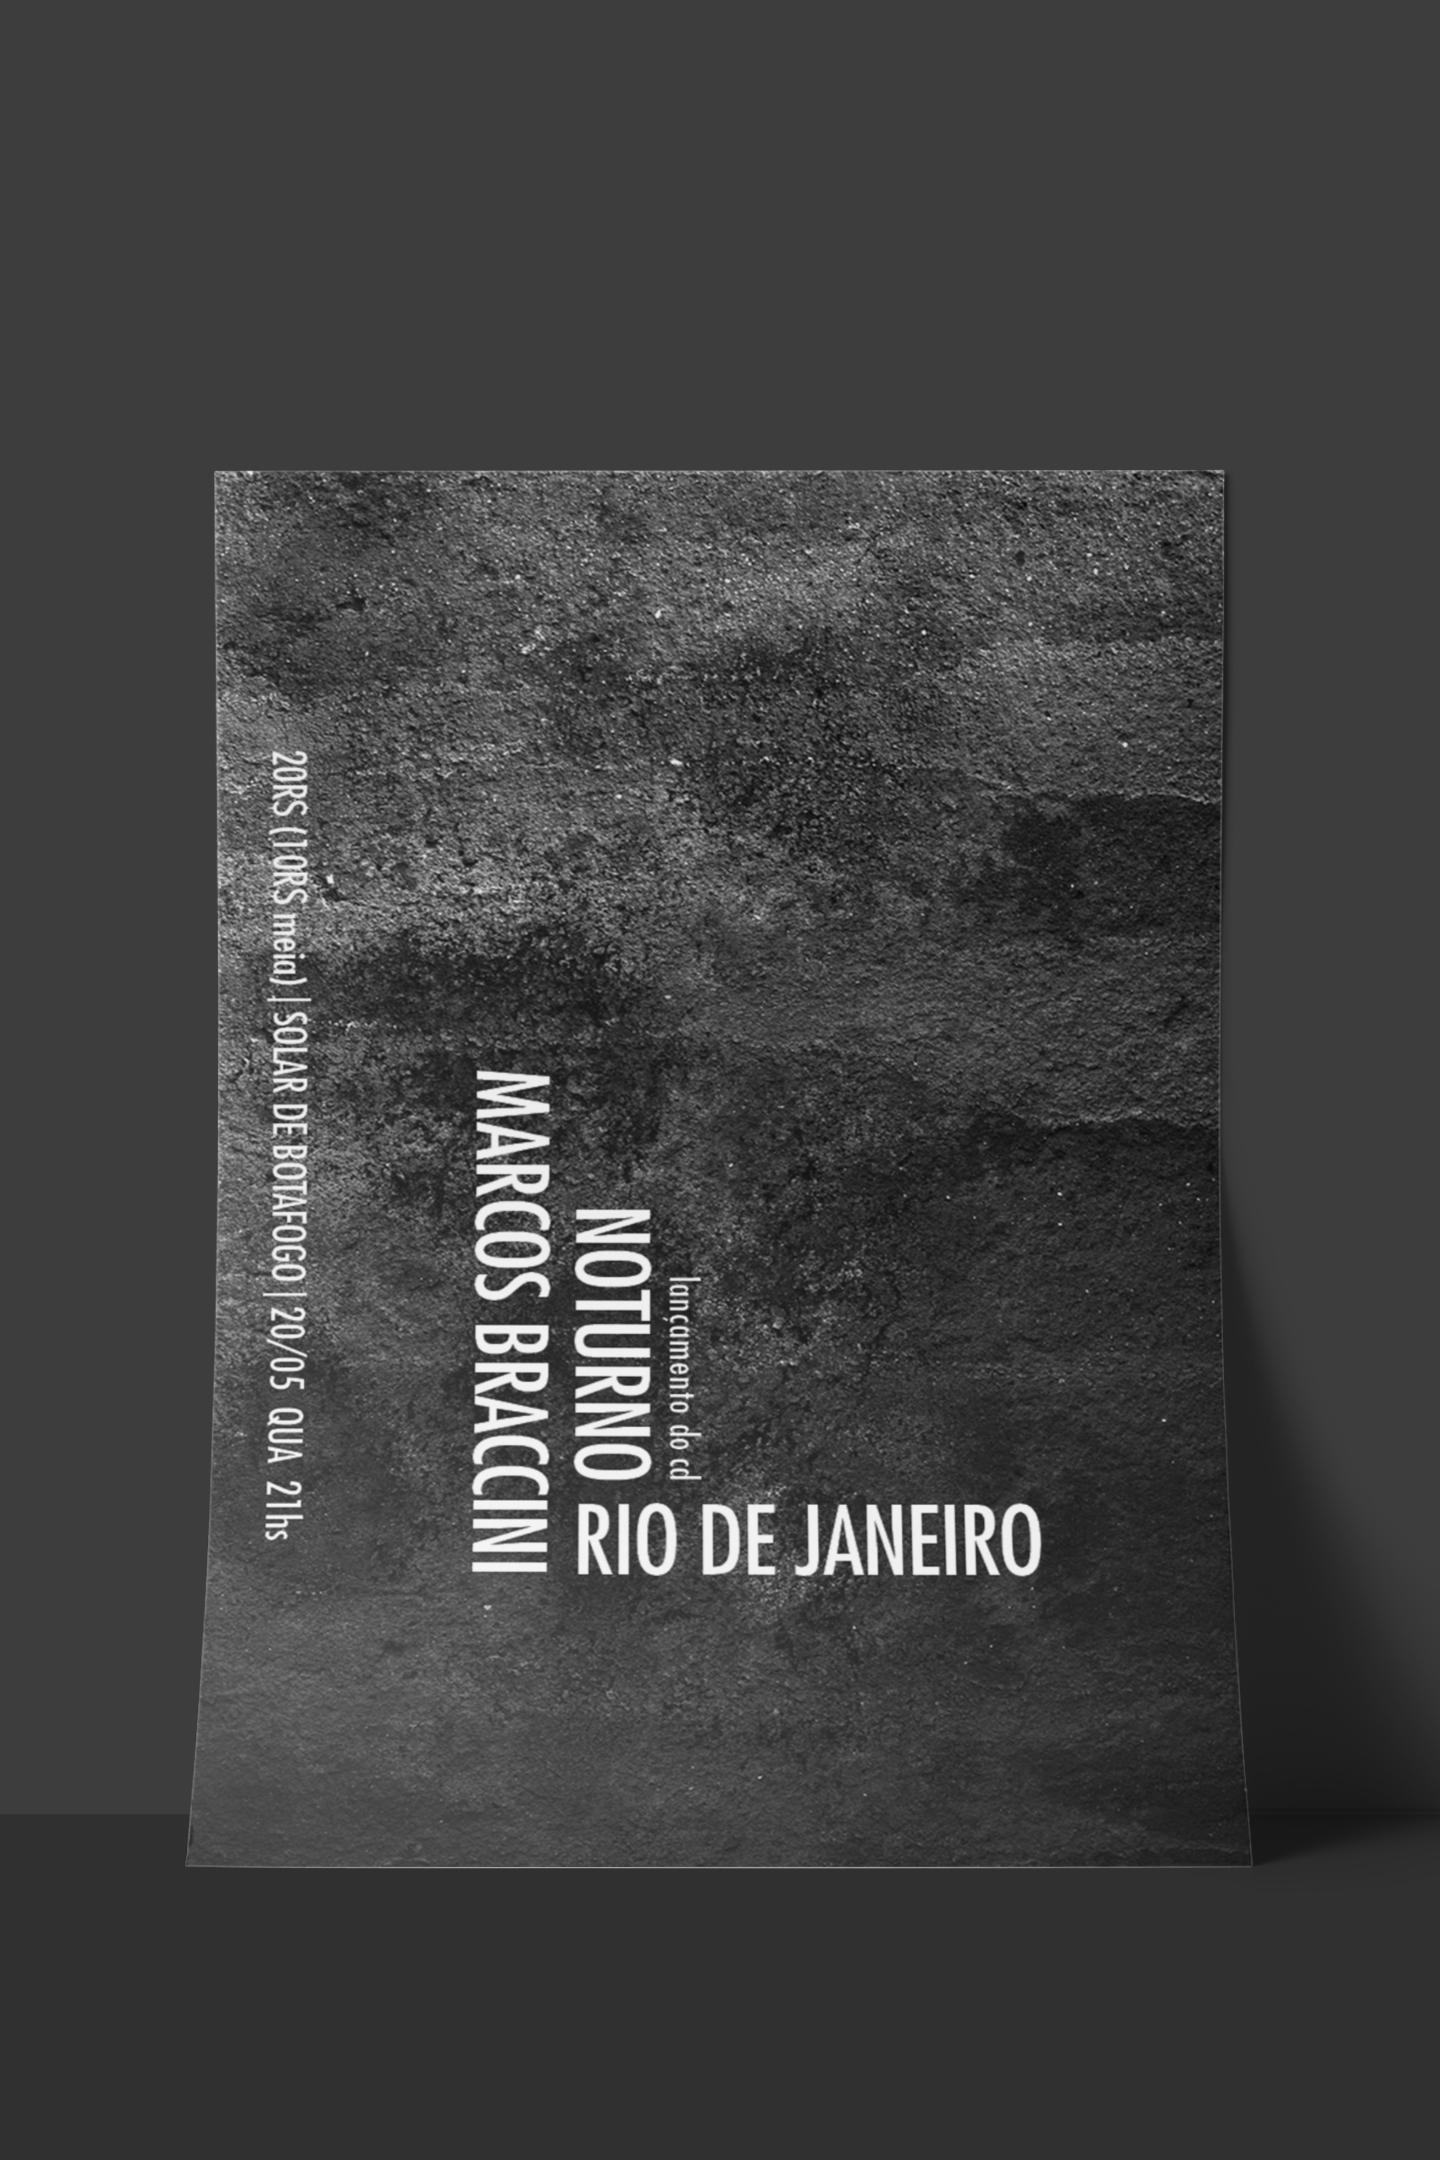 Noturno-Poster-Series-5